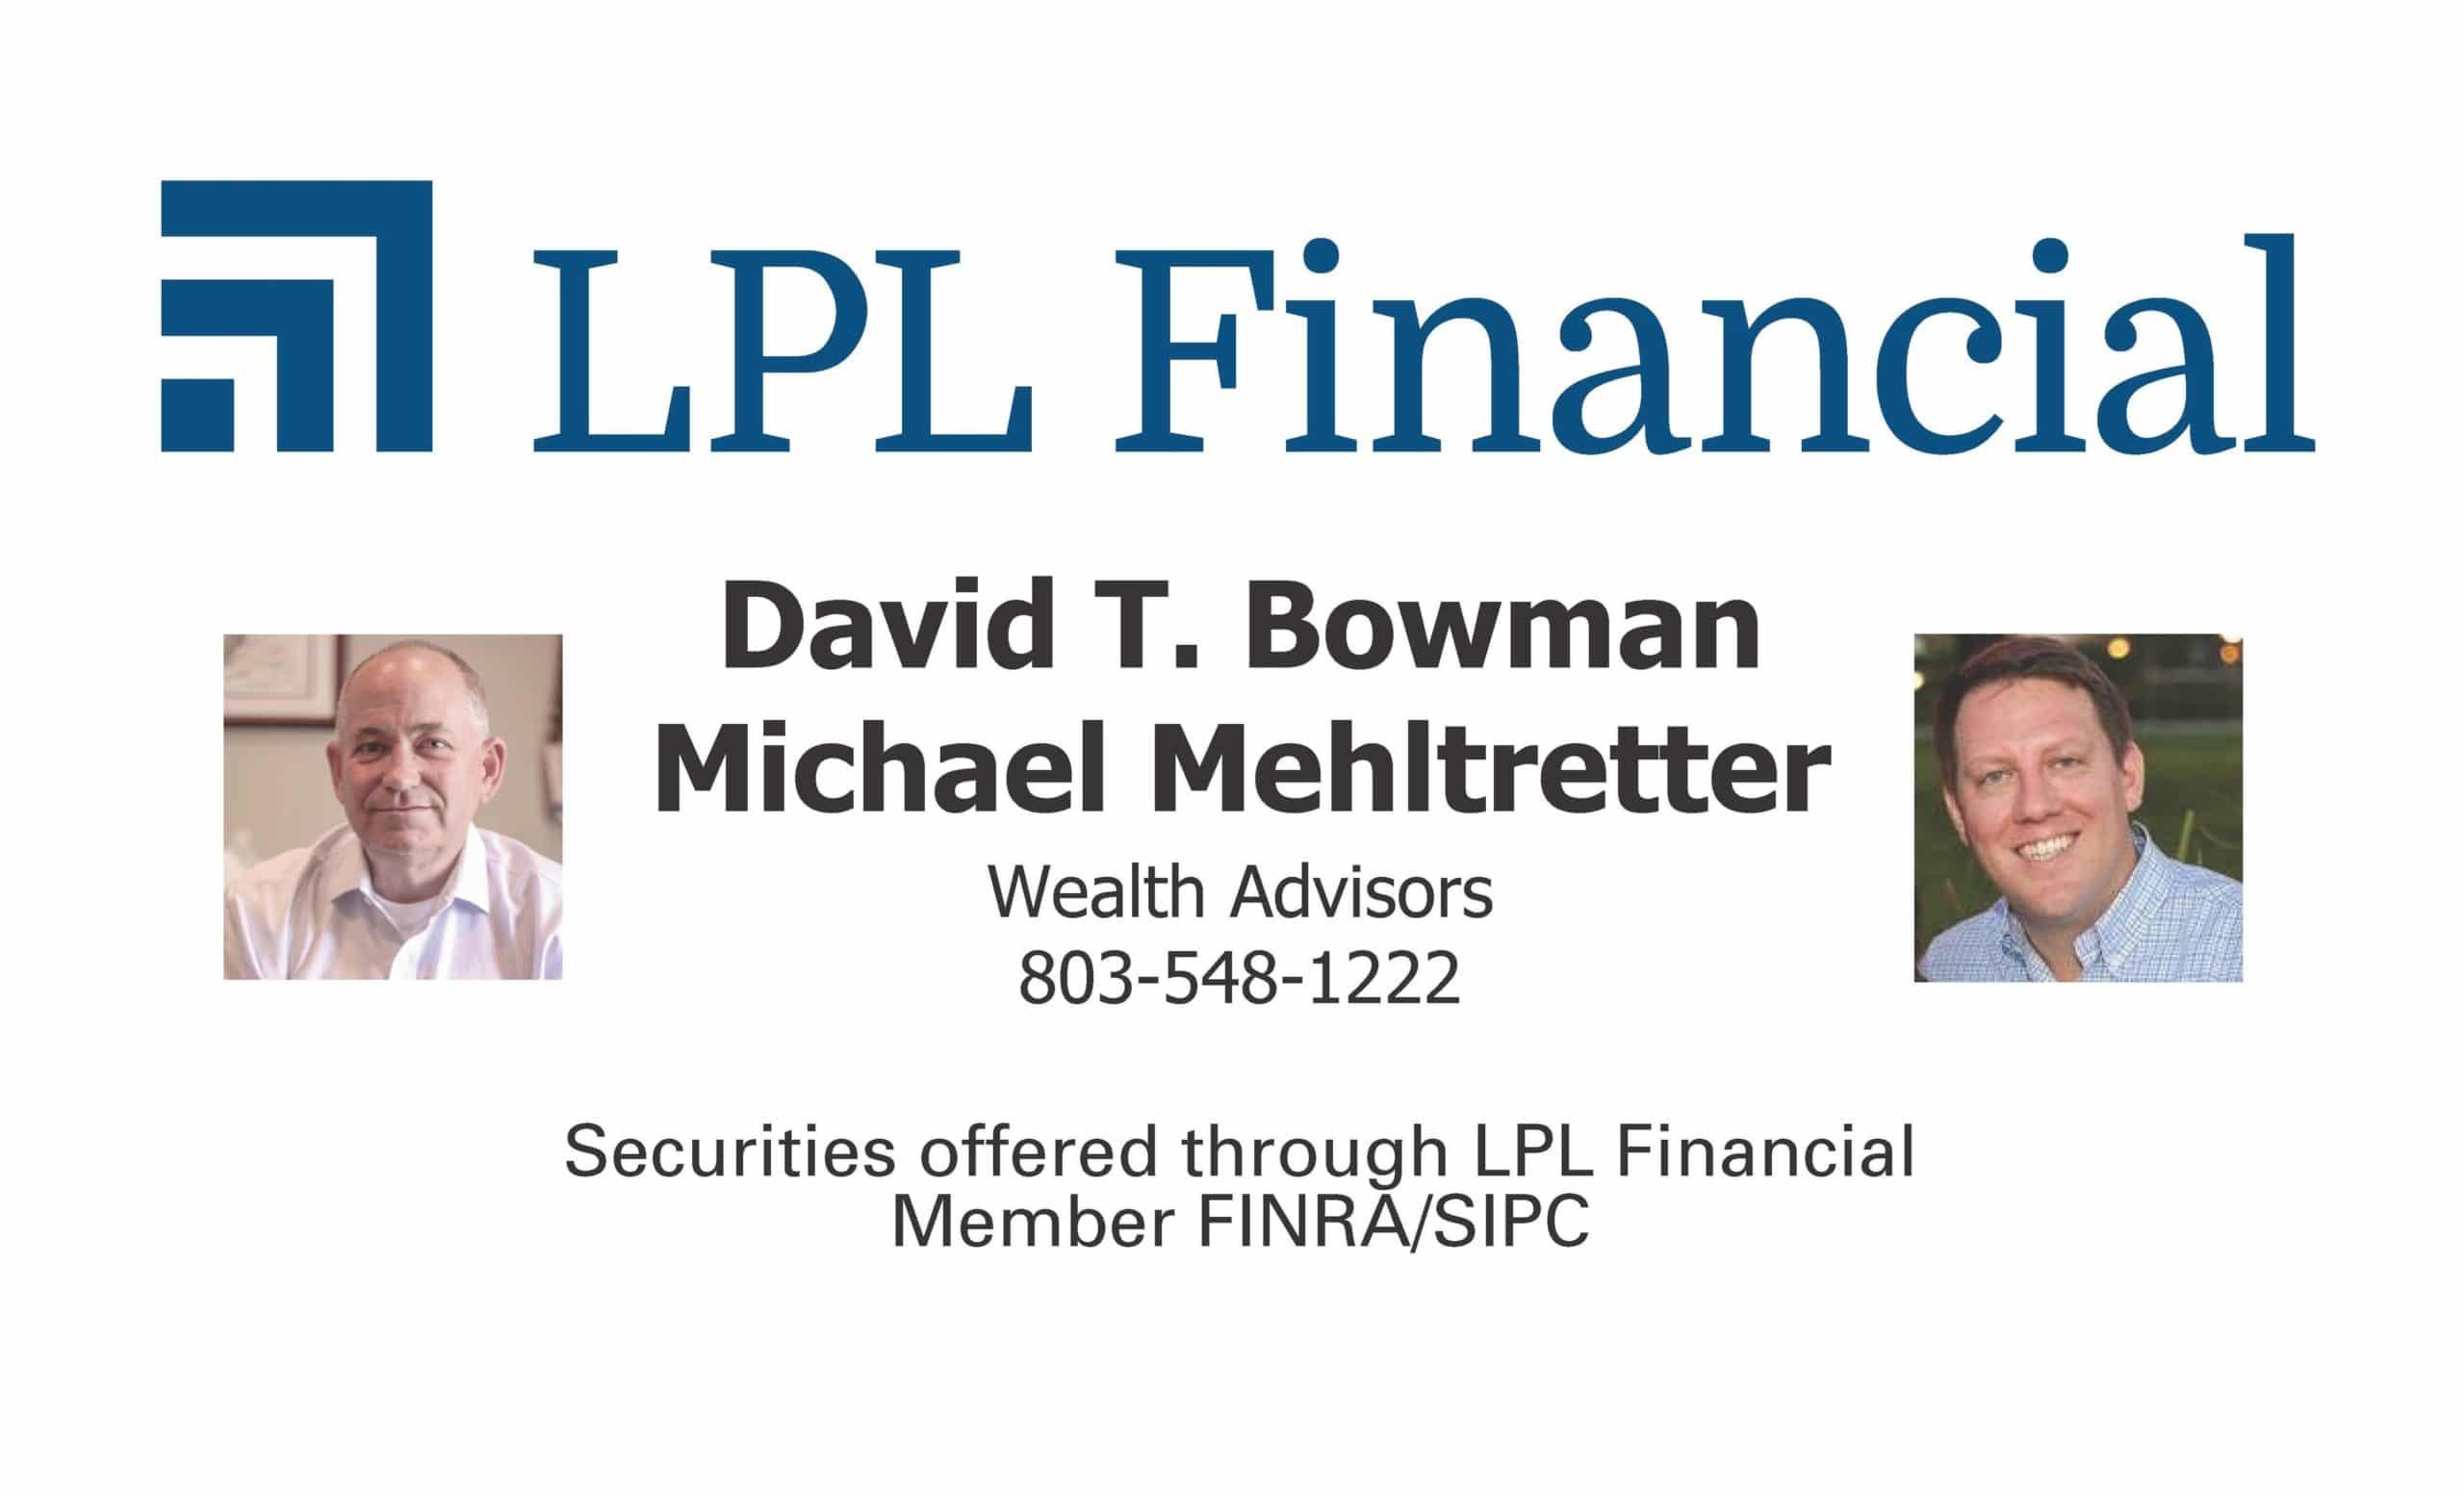 DavidBowman_LPL